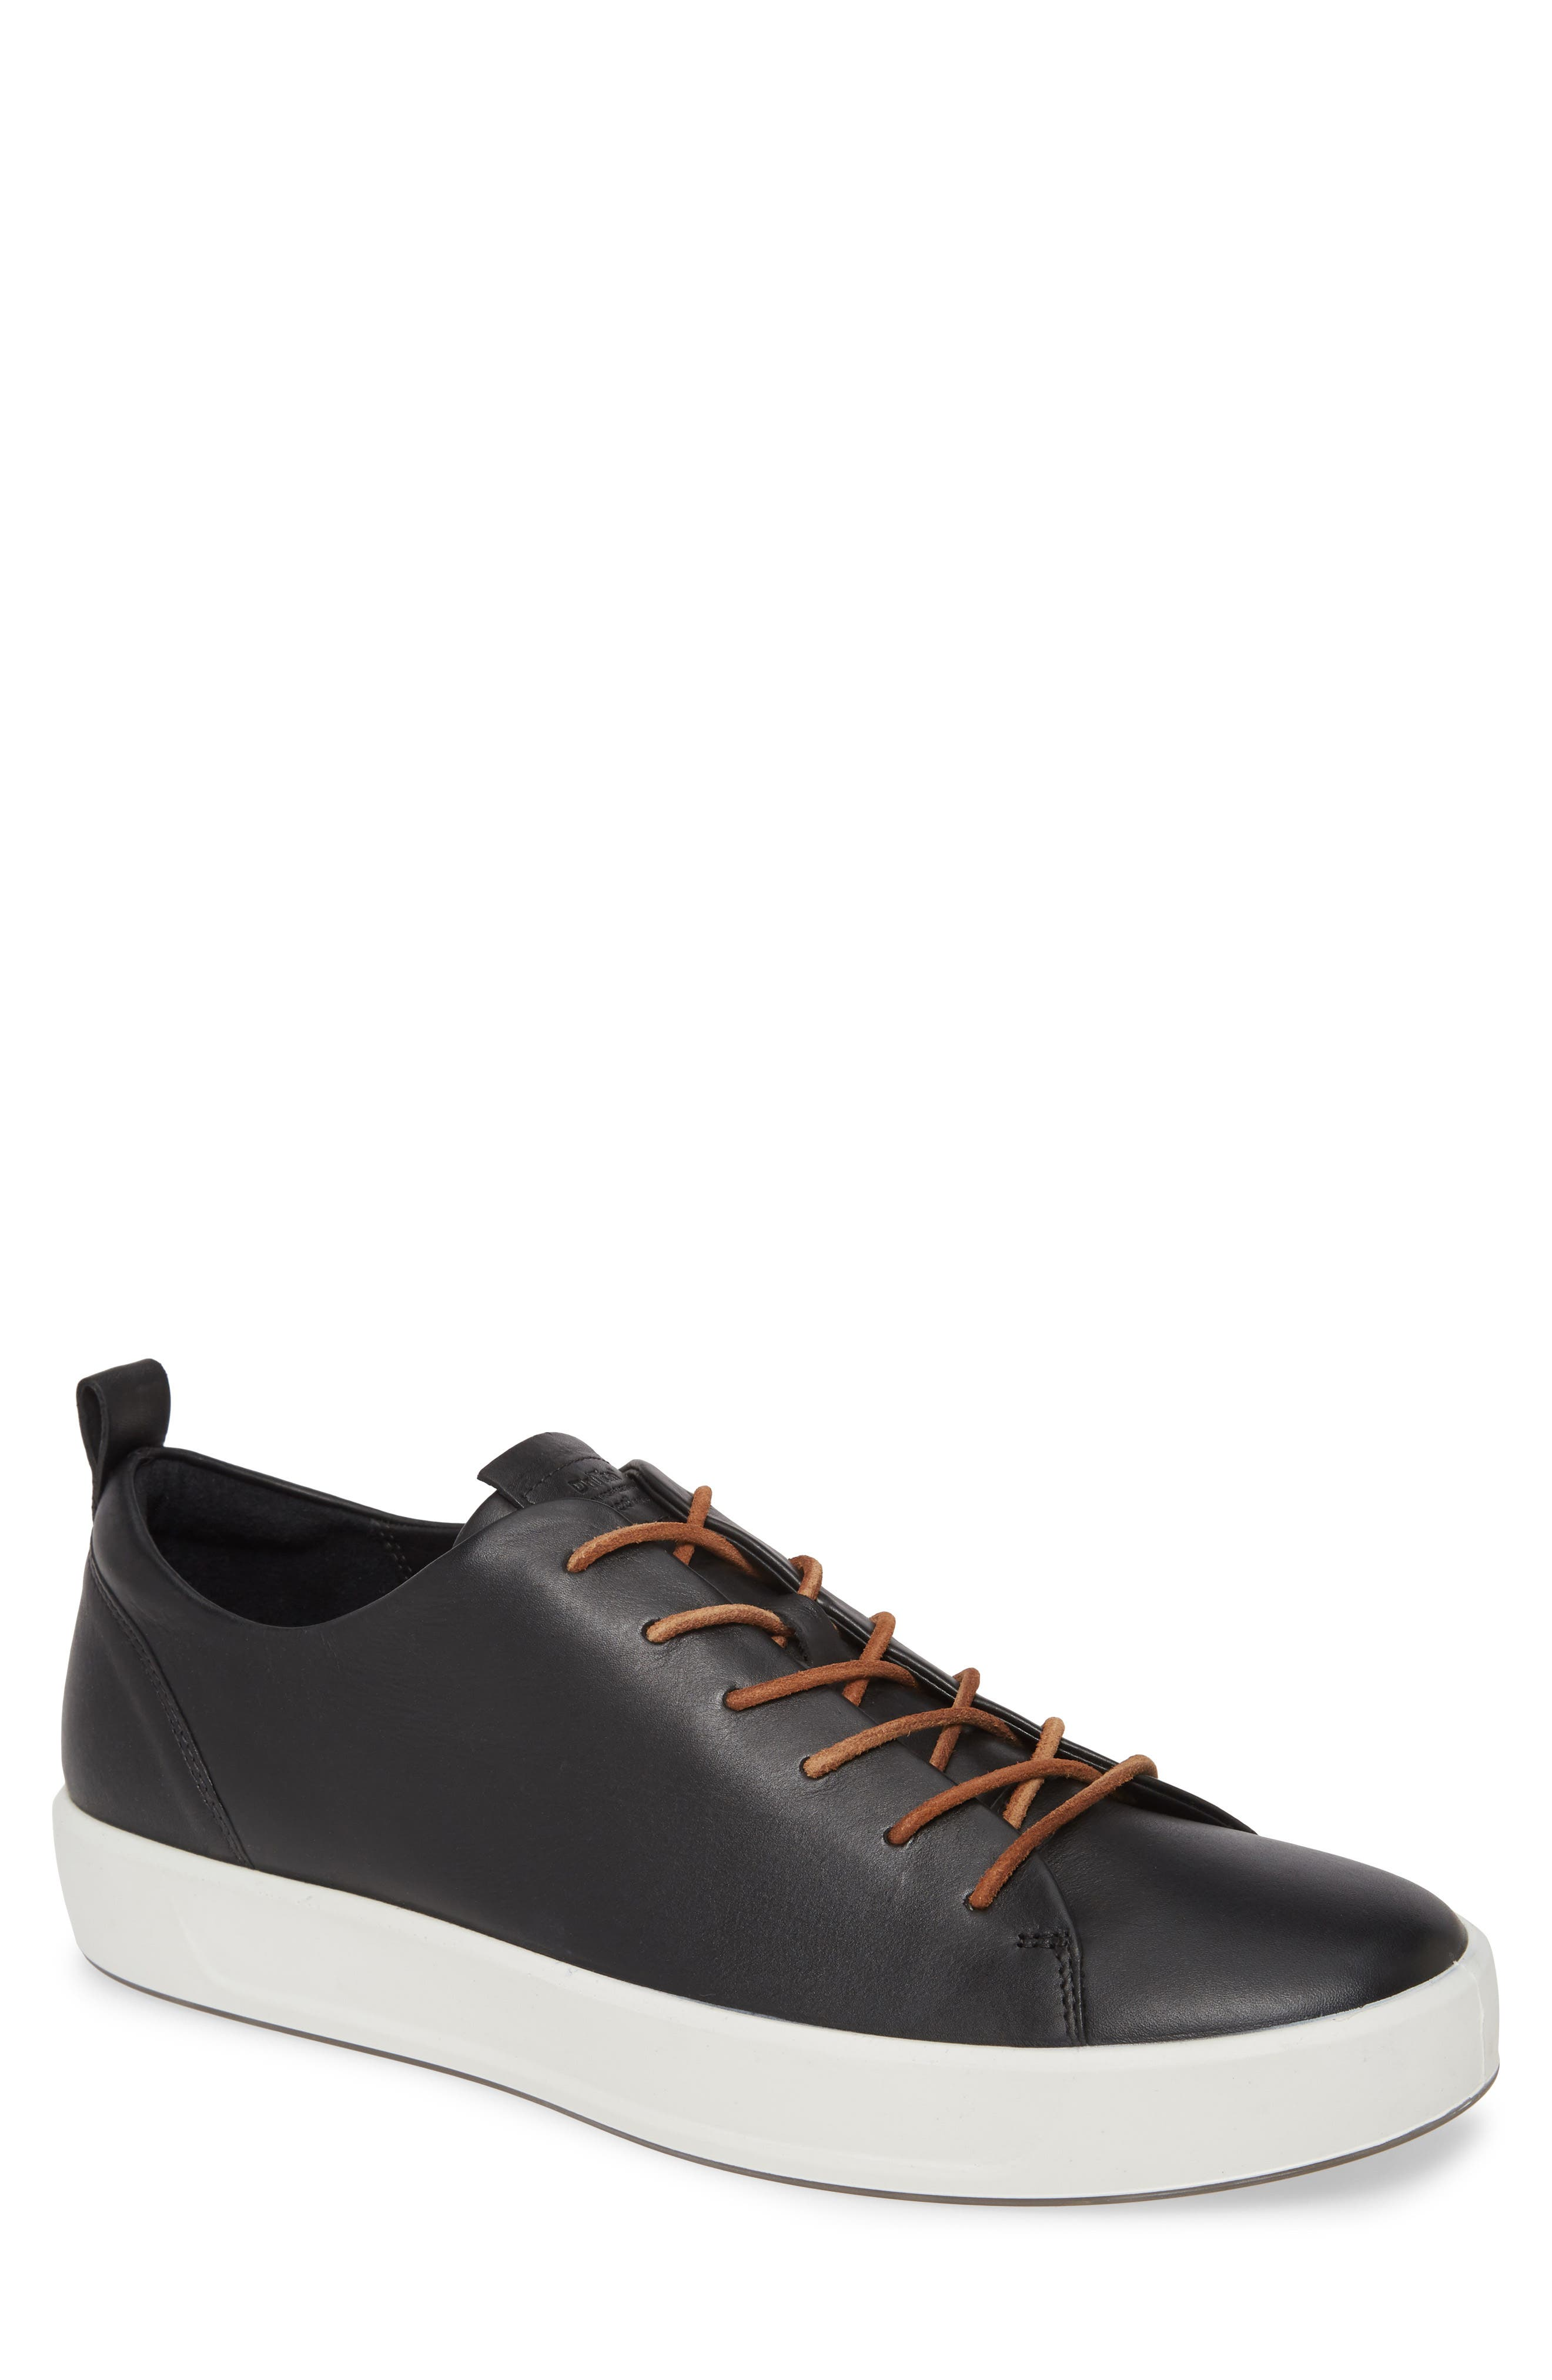 Image of ECCO Soft VIII Sneaker